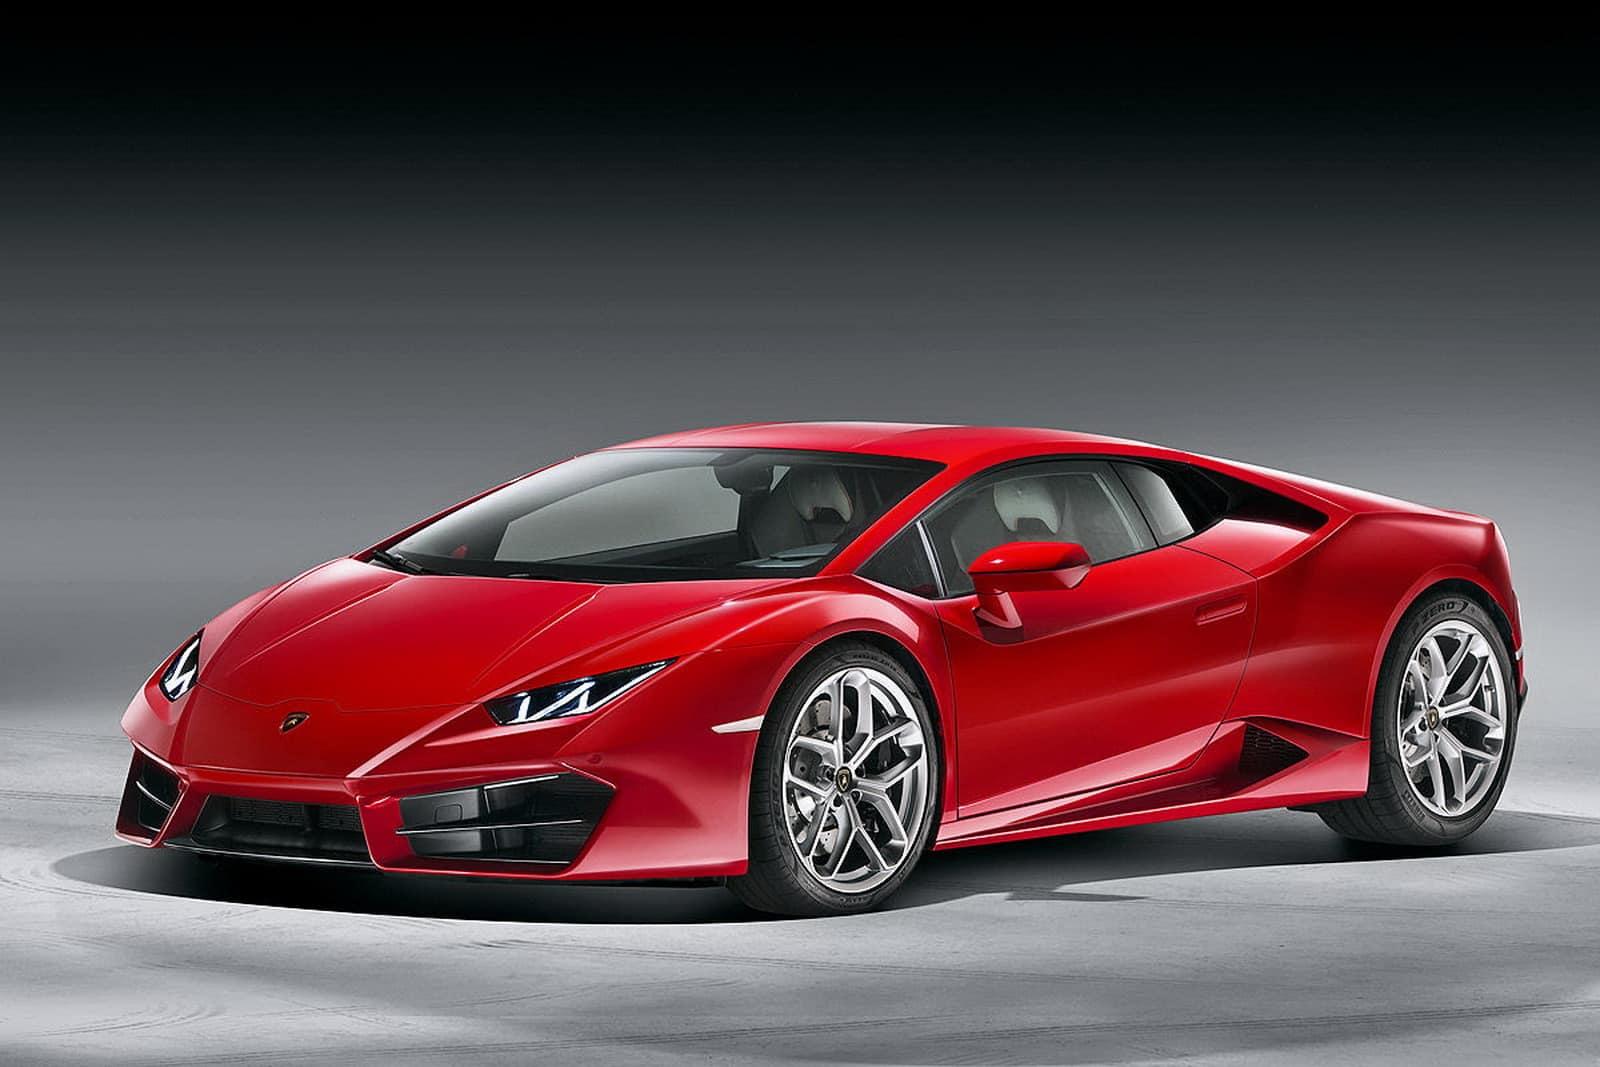 Lamborghini Huracan LP 580-2 RWD Edition